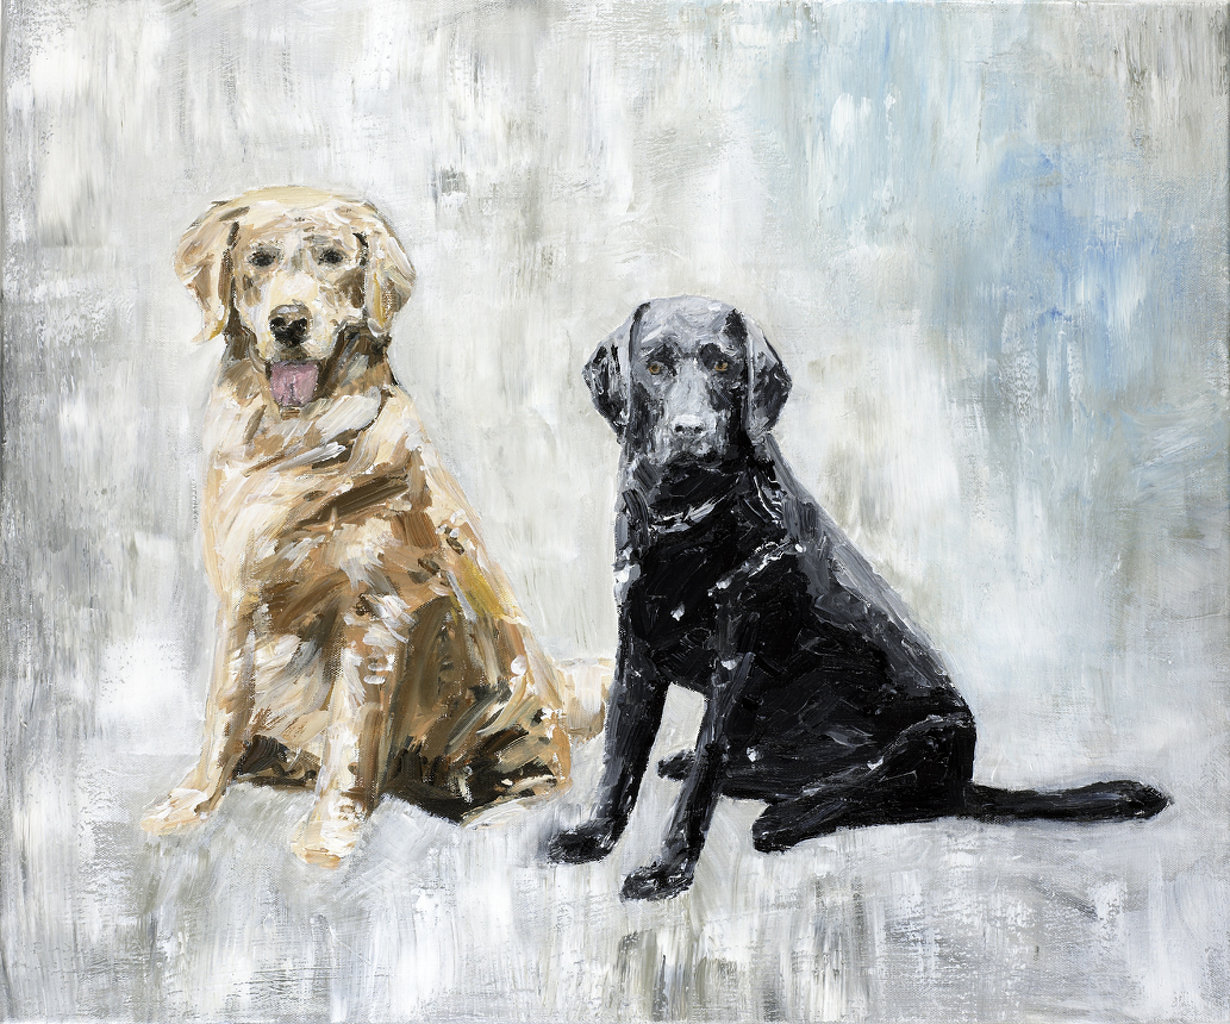 Jasper and Cooper